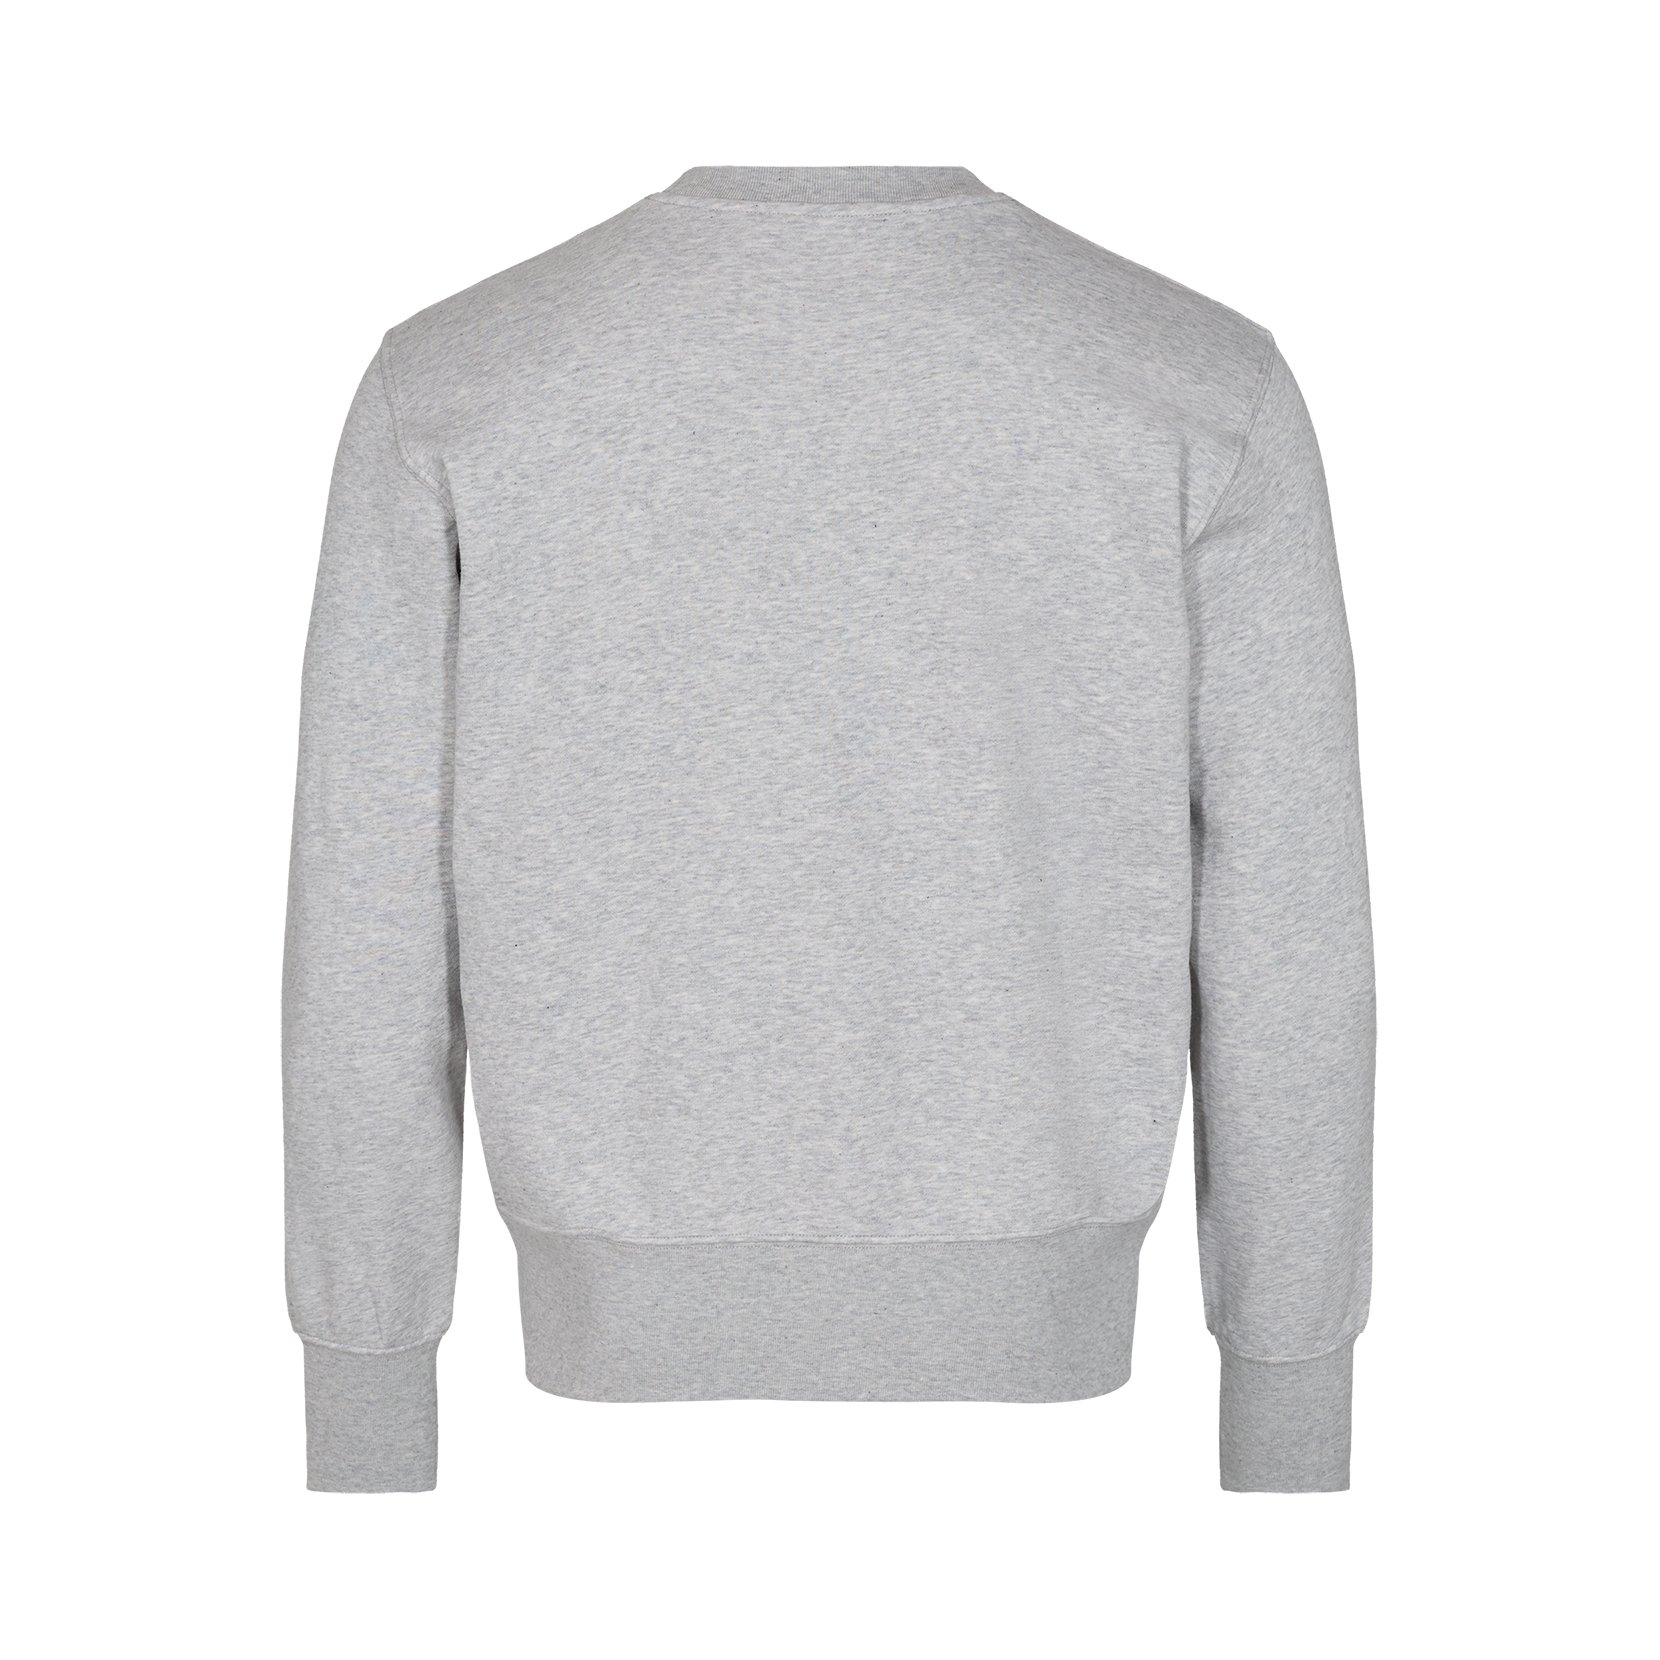 H2O Anholt sweatshirt, light grey melange, medium